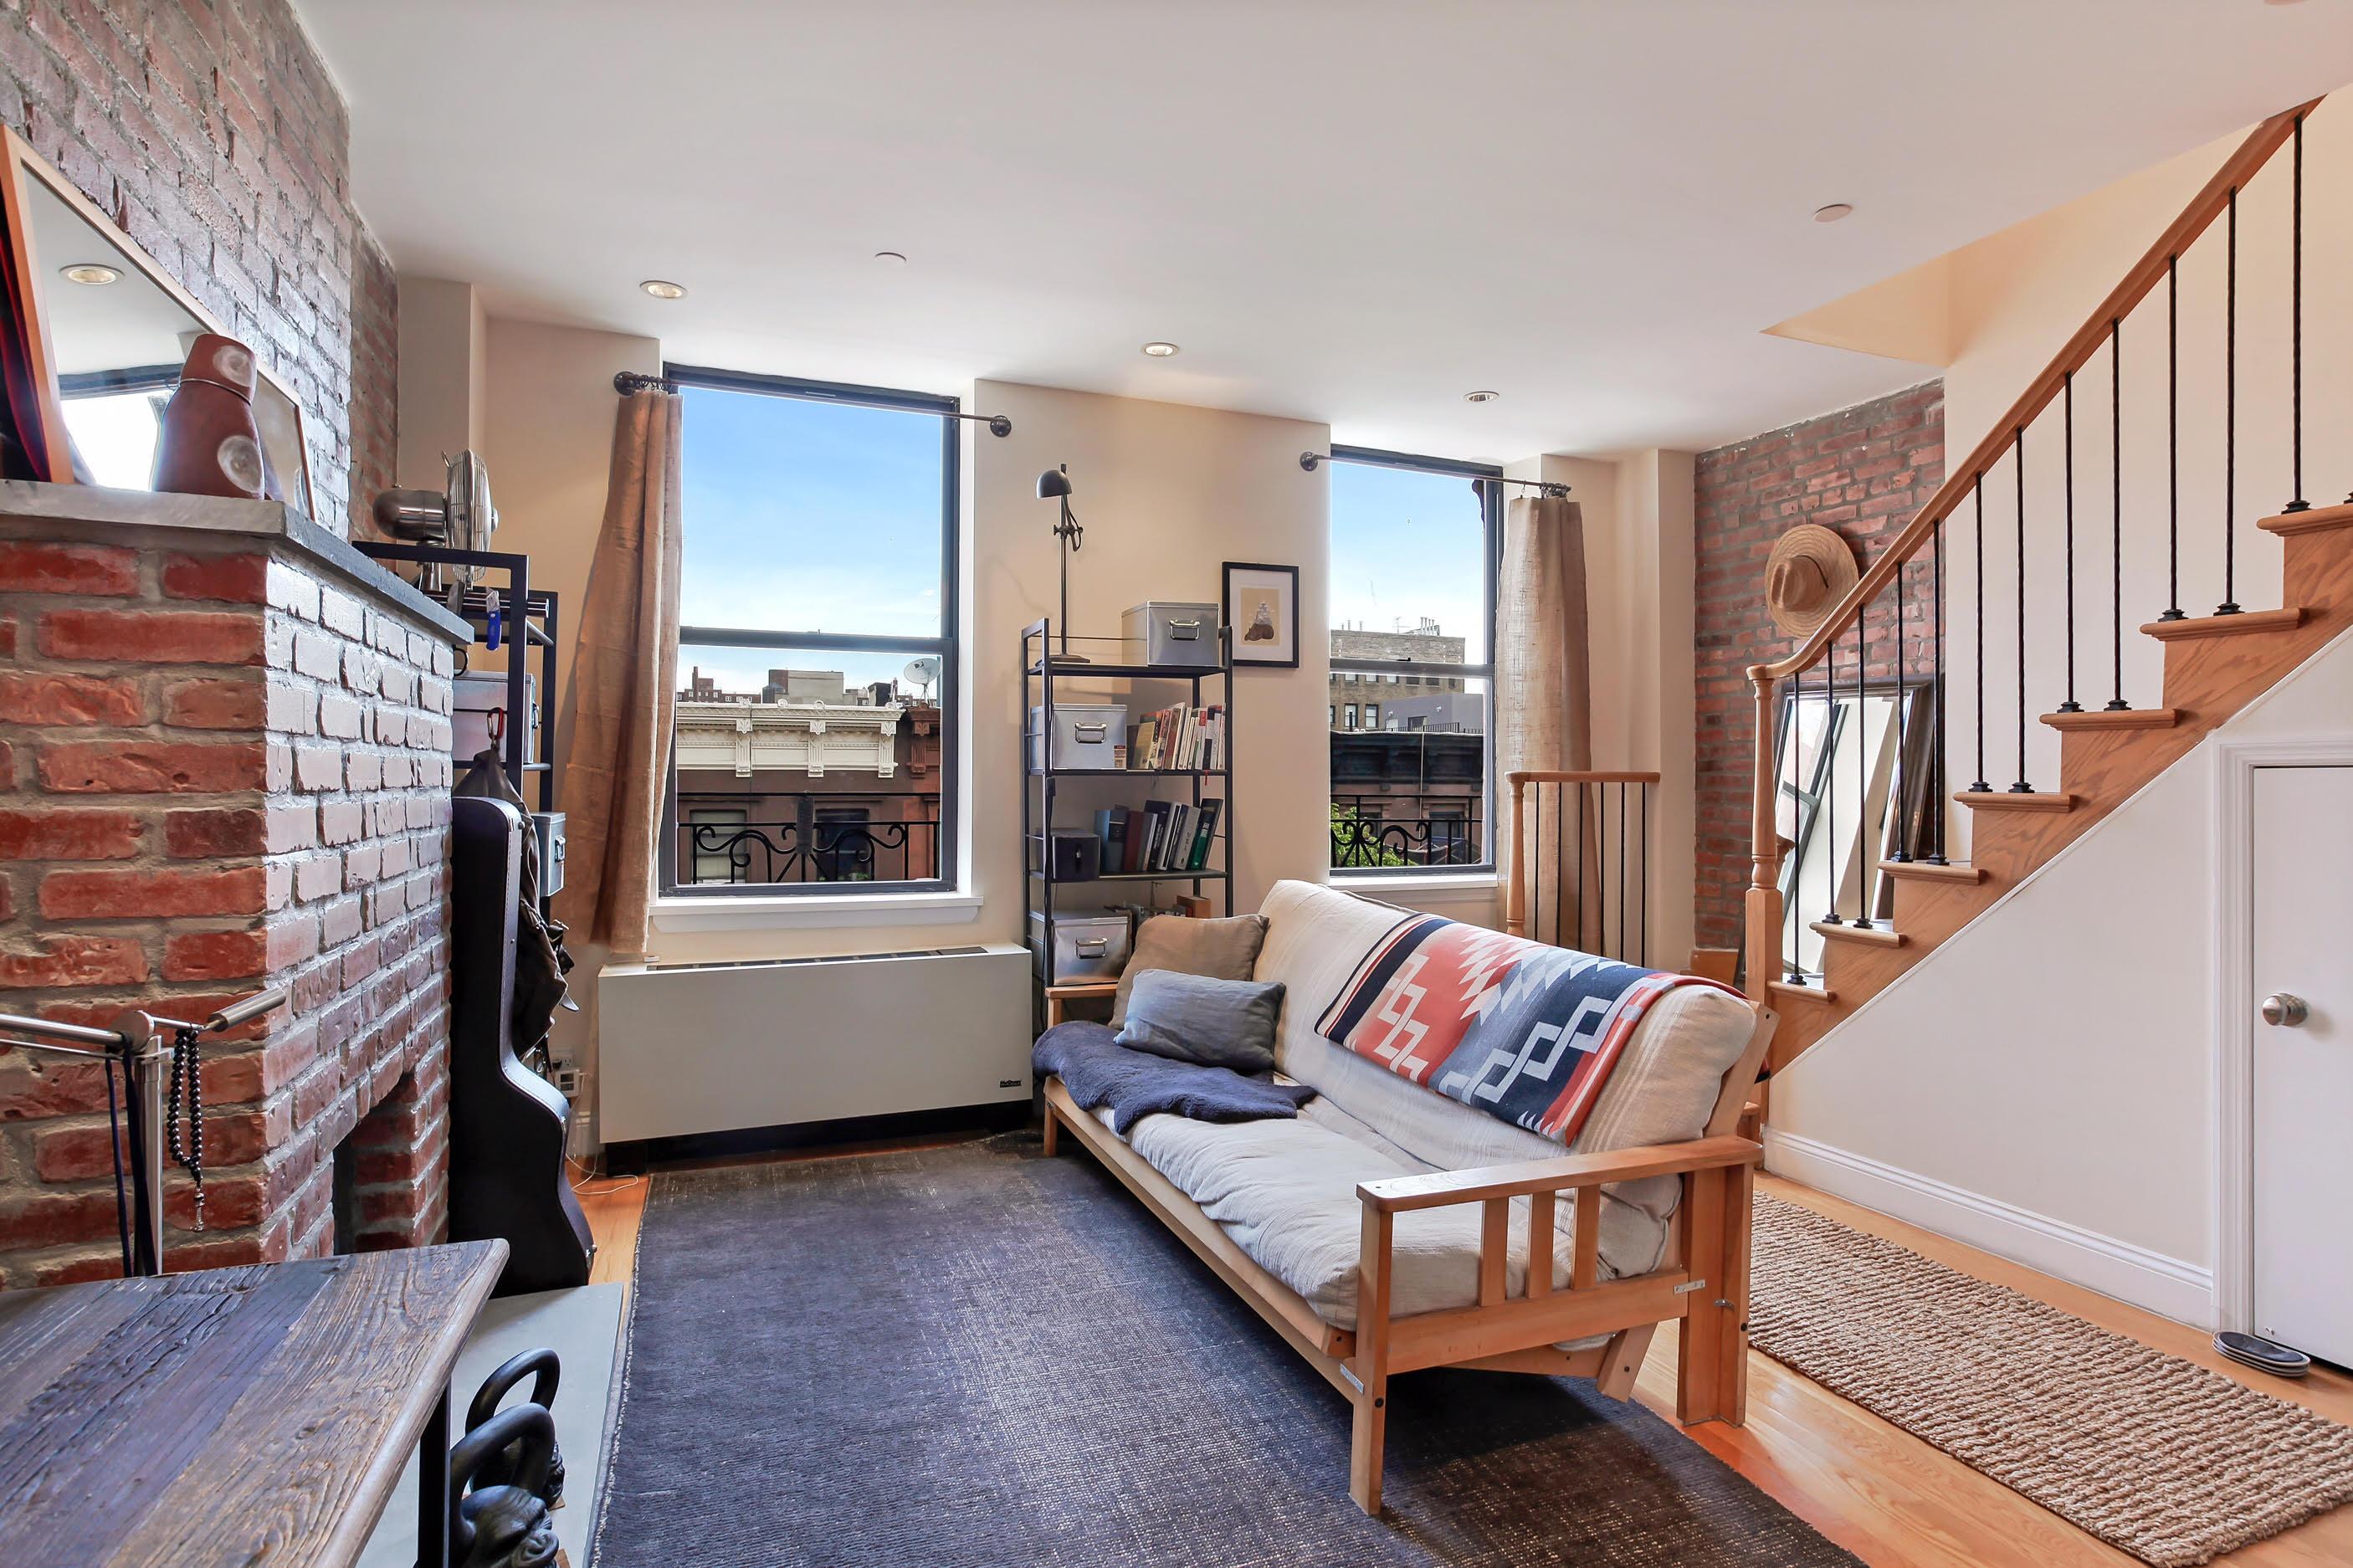 252 West 123rd Street, harlem, living room, fireplace, condo